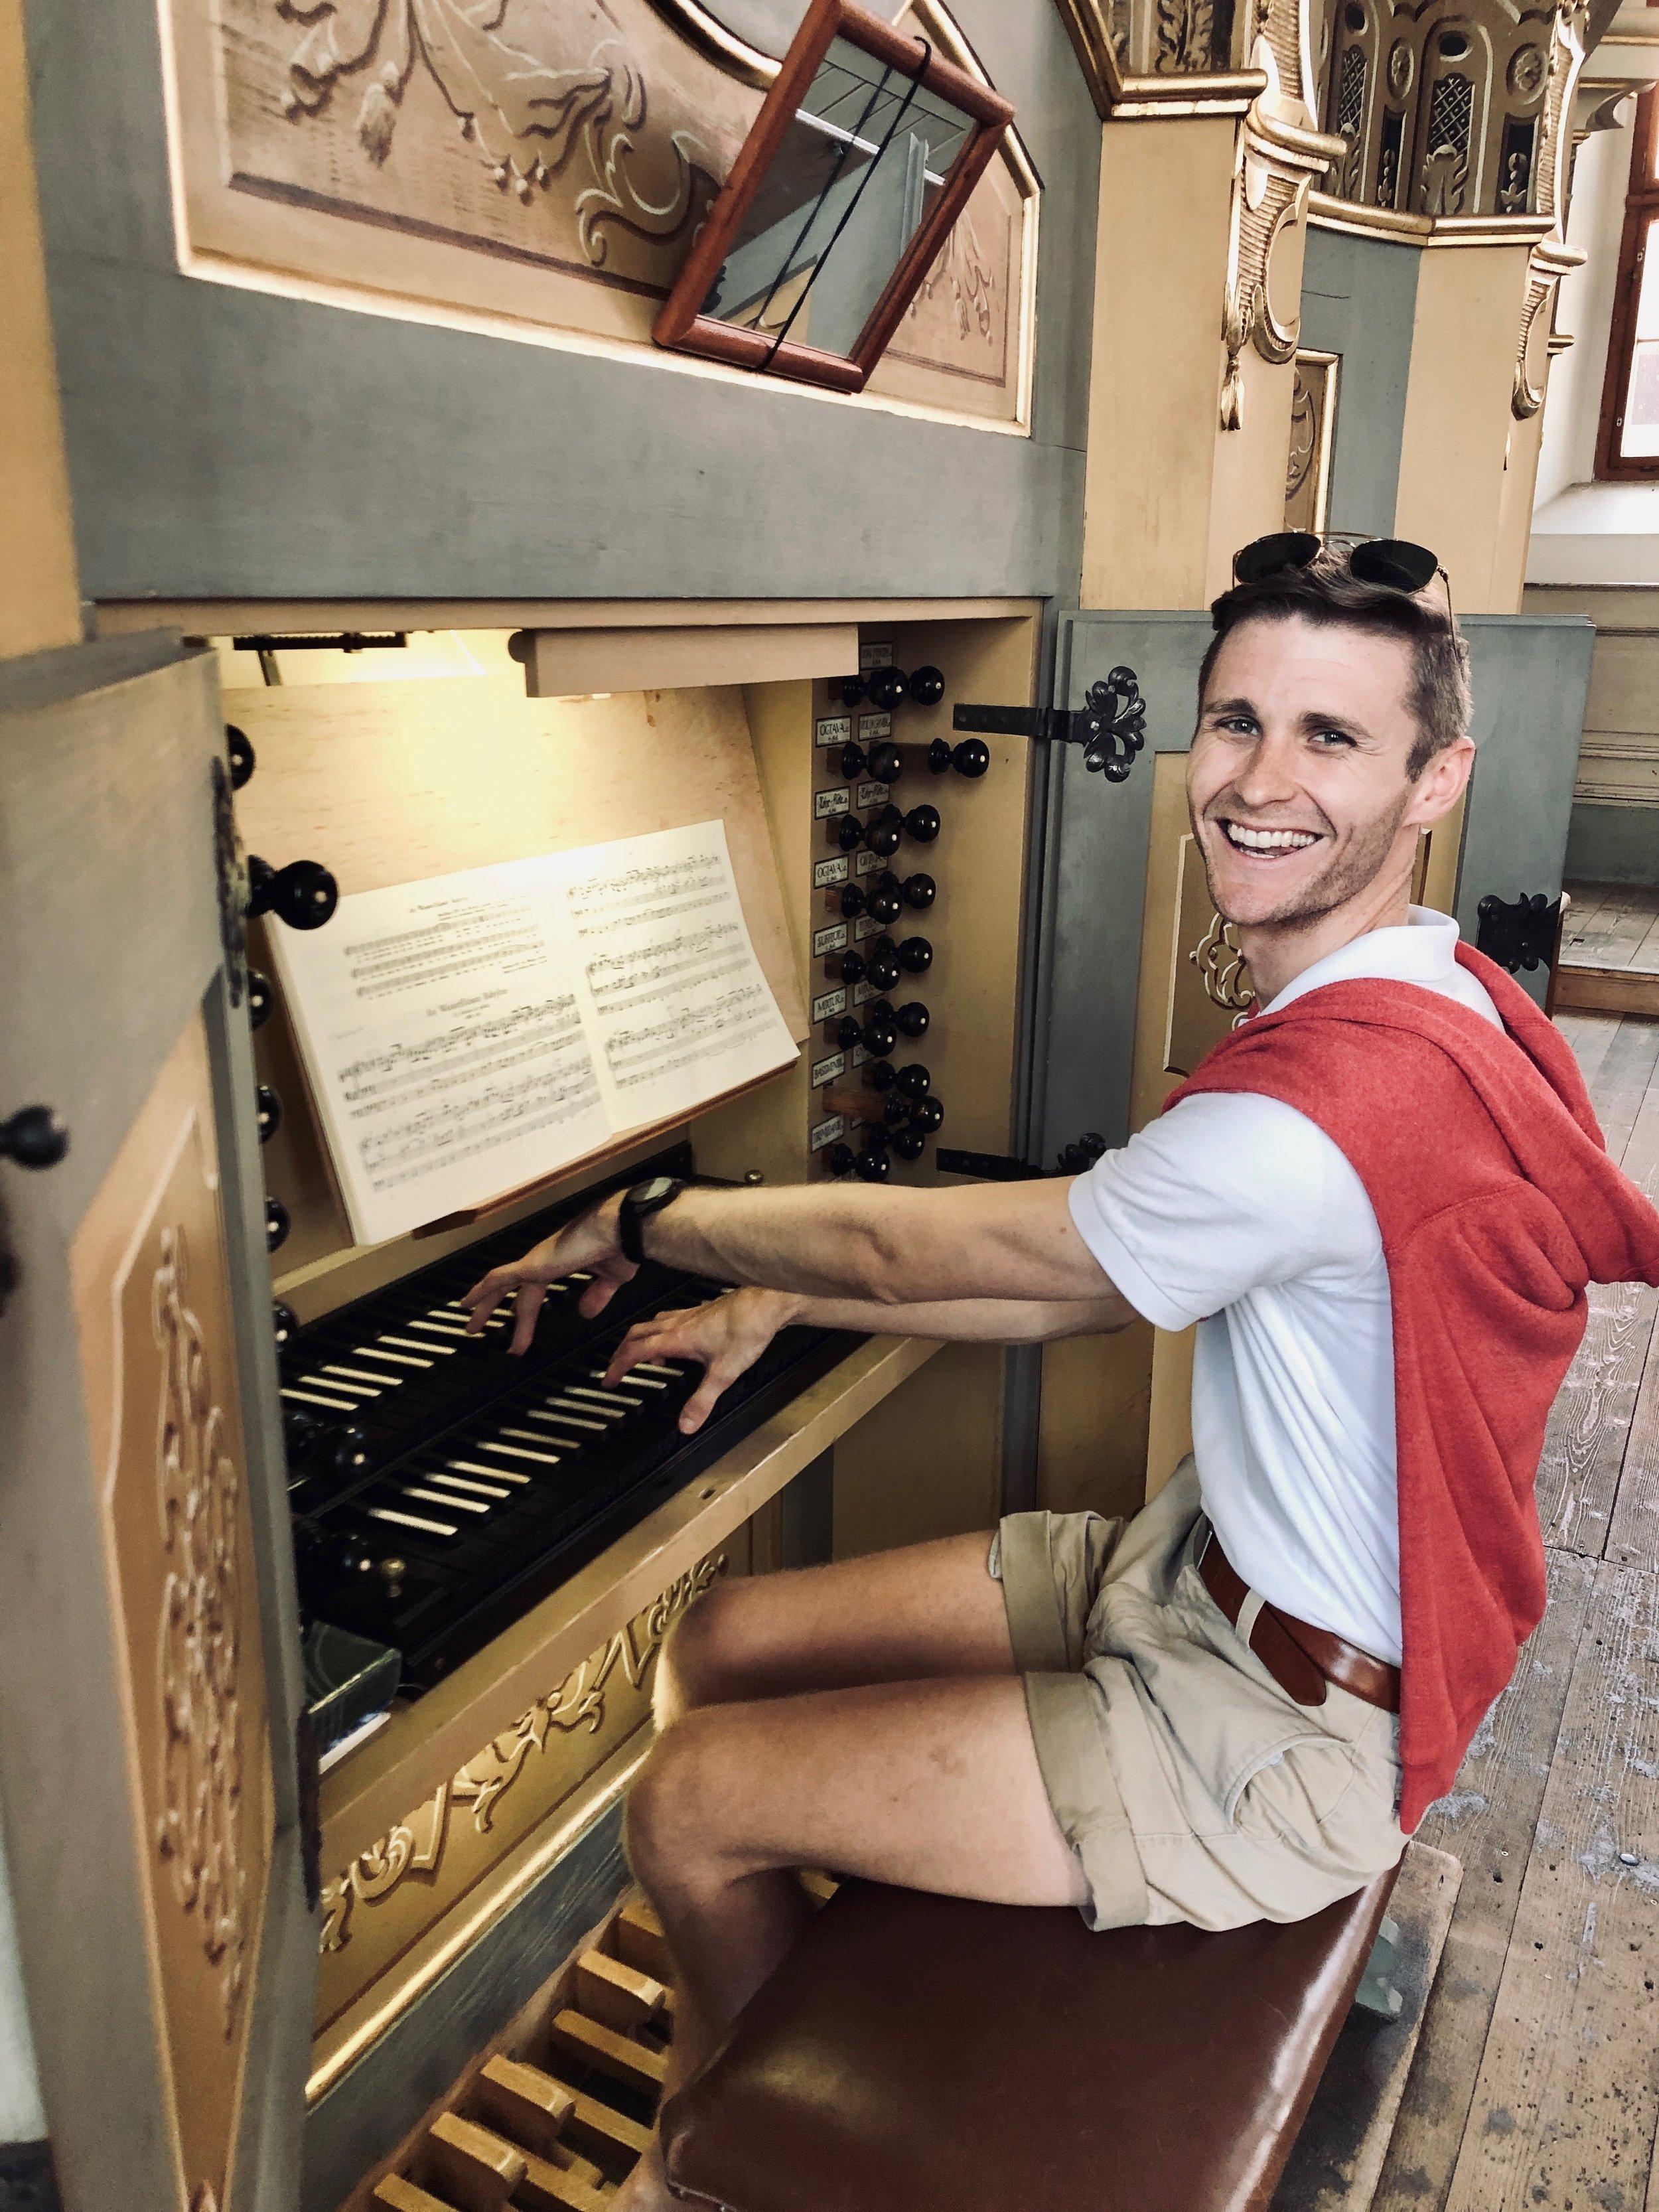 Evan Currie is all smiles at the 1735 Gottfried Silbermann organ, St. Petrikirche, Freiberg.